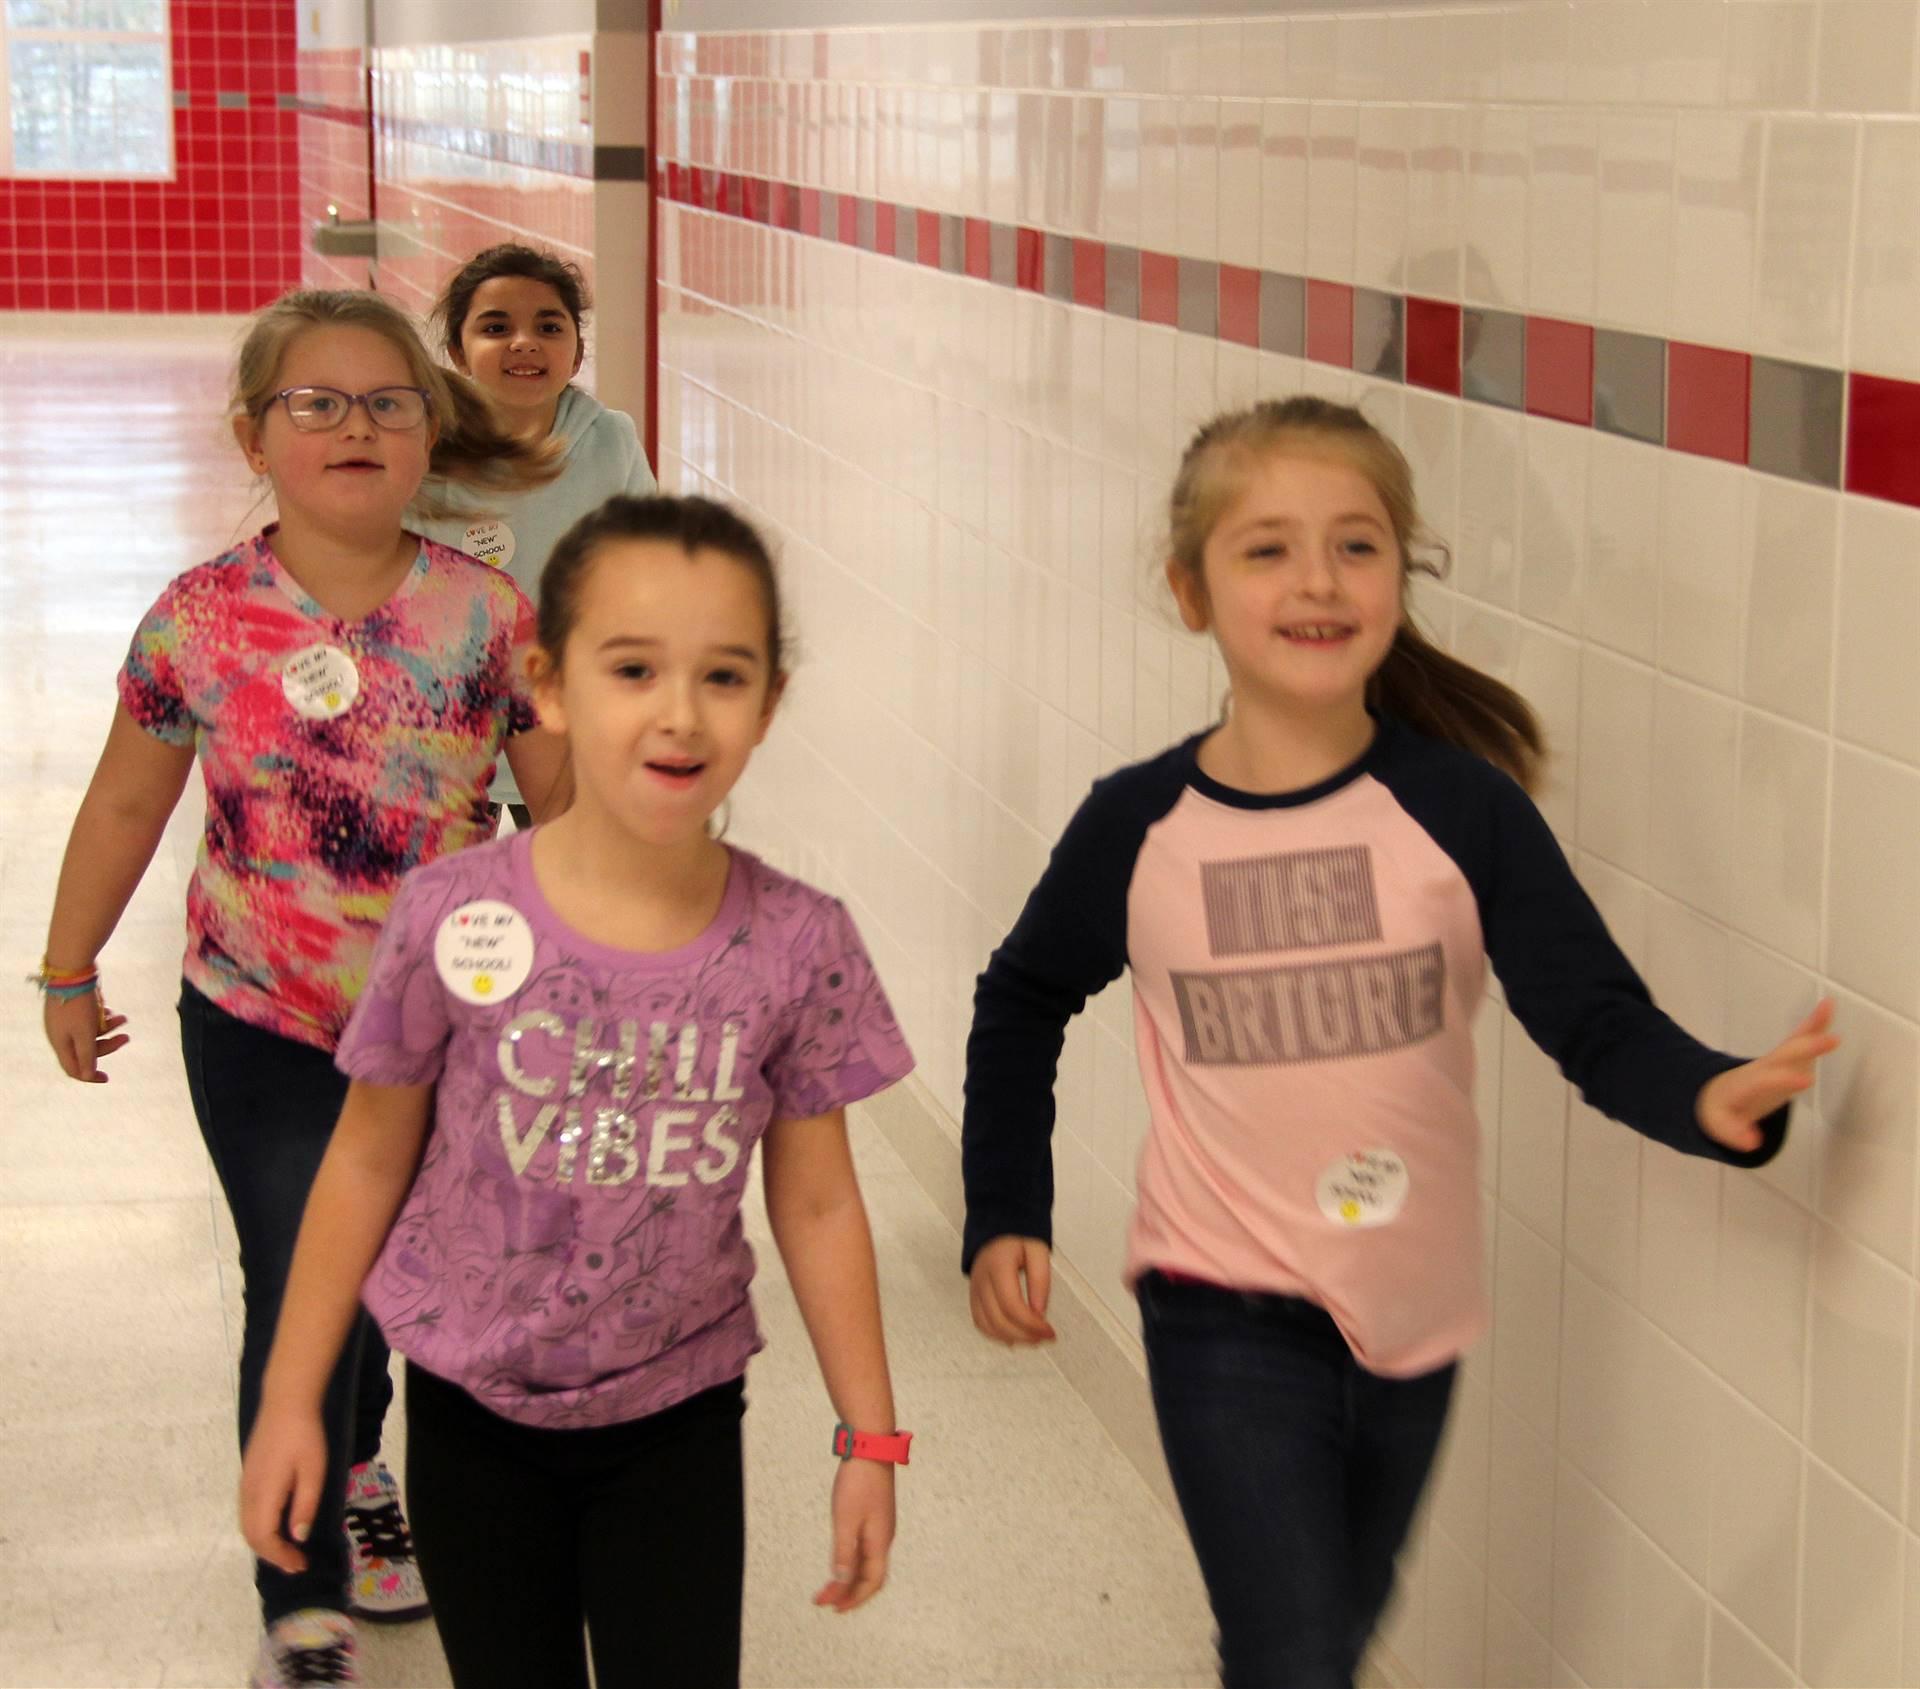 four students walking through hallway